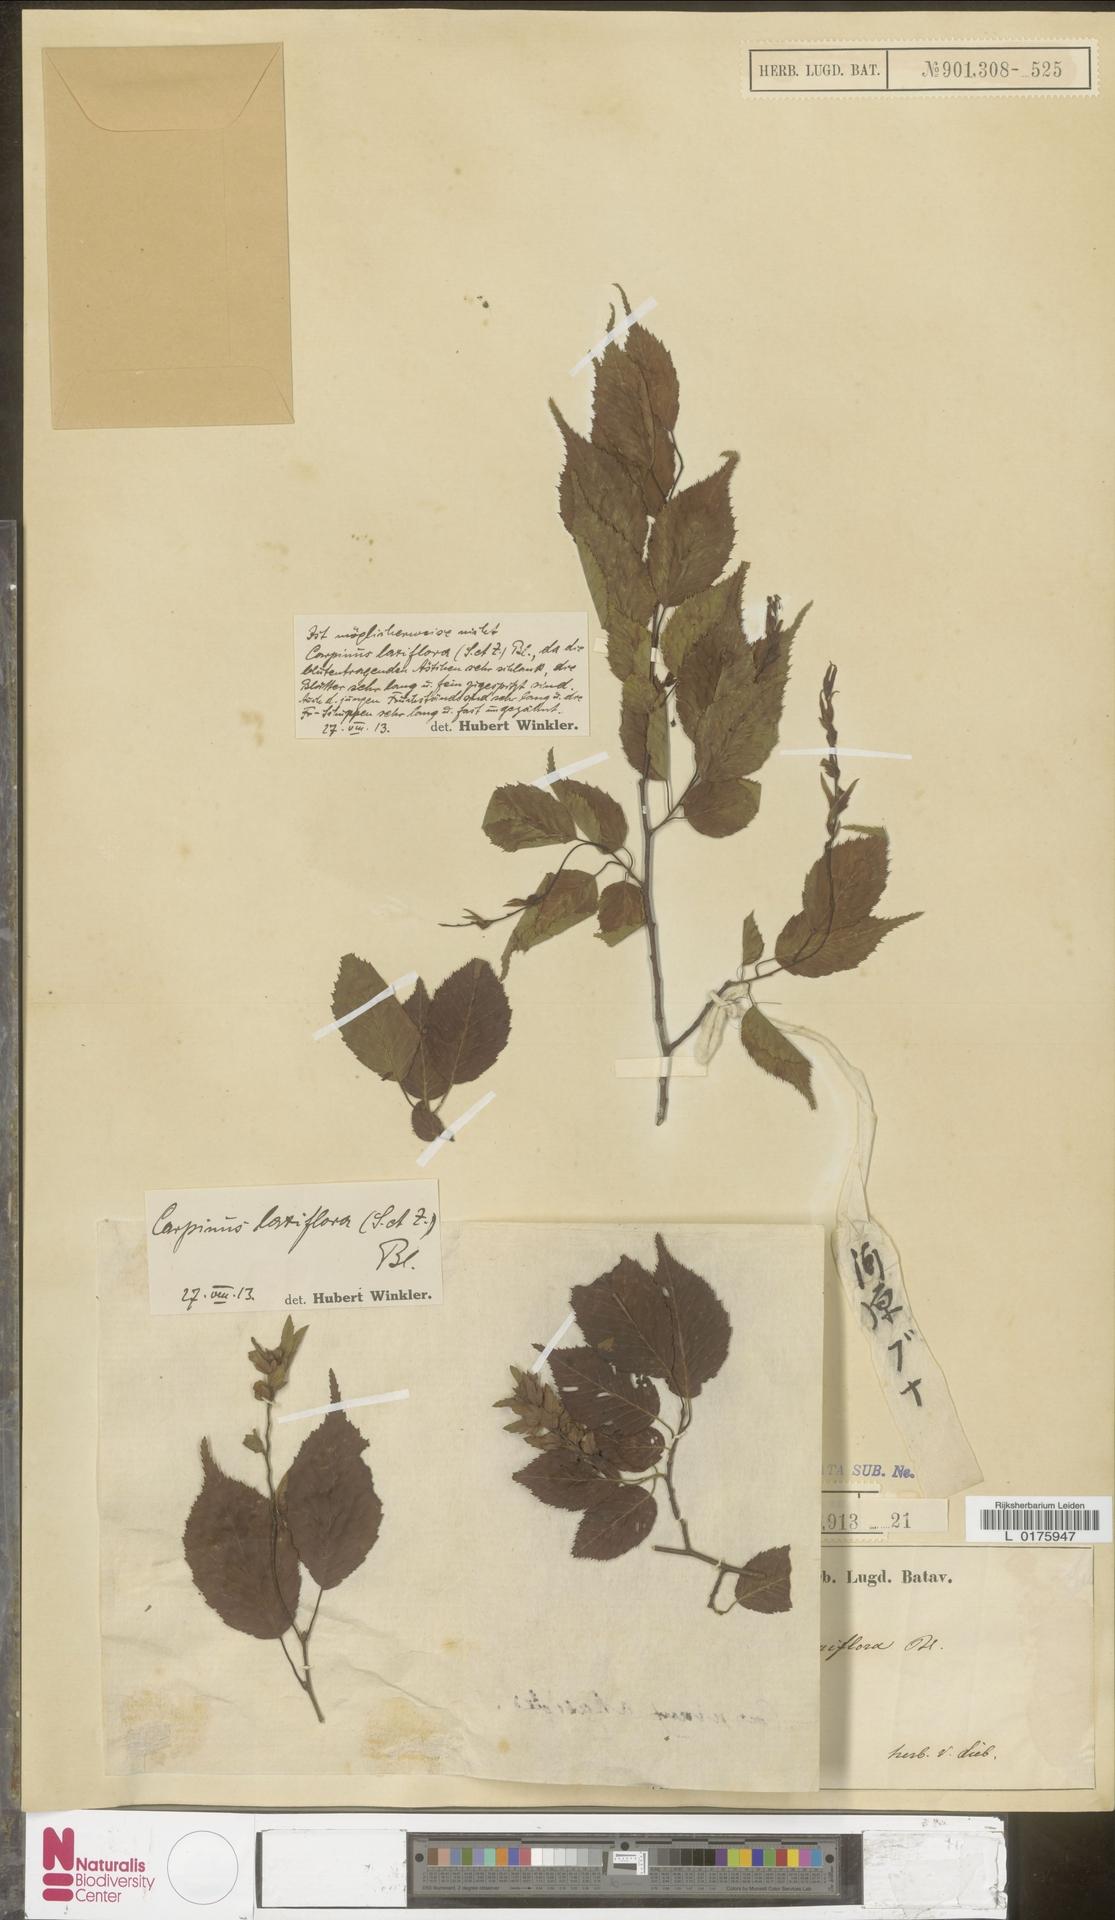 L  0175947   Carpinus laxiflora (Siebold & Zucc.) Blume